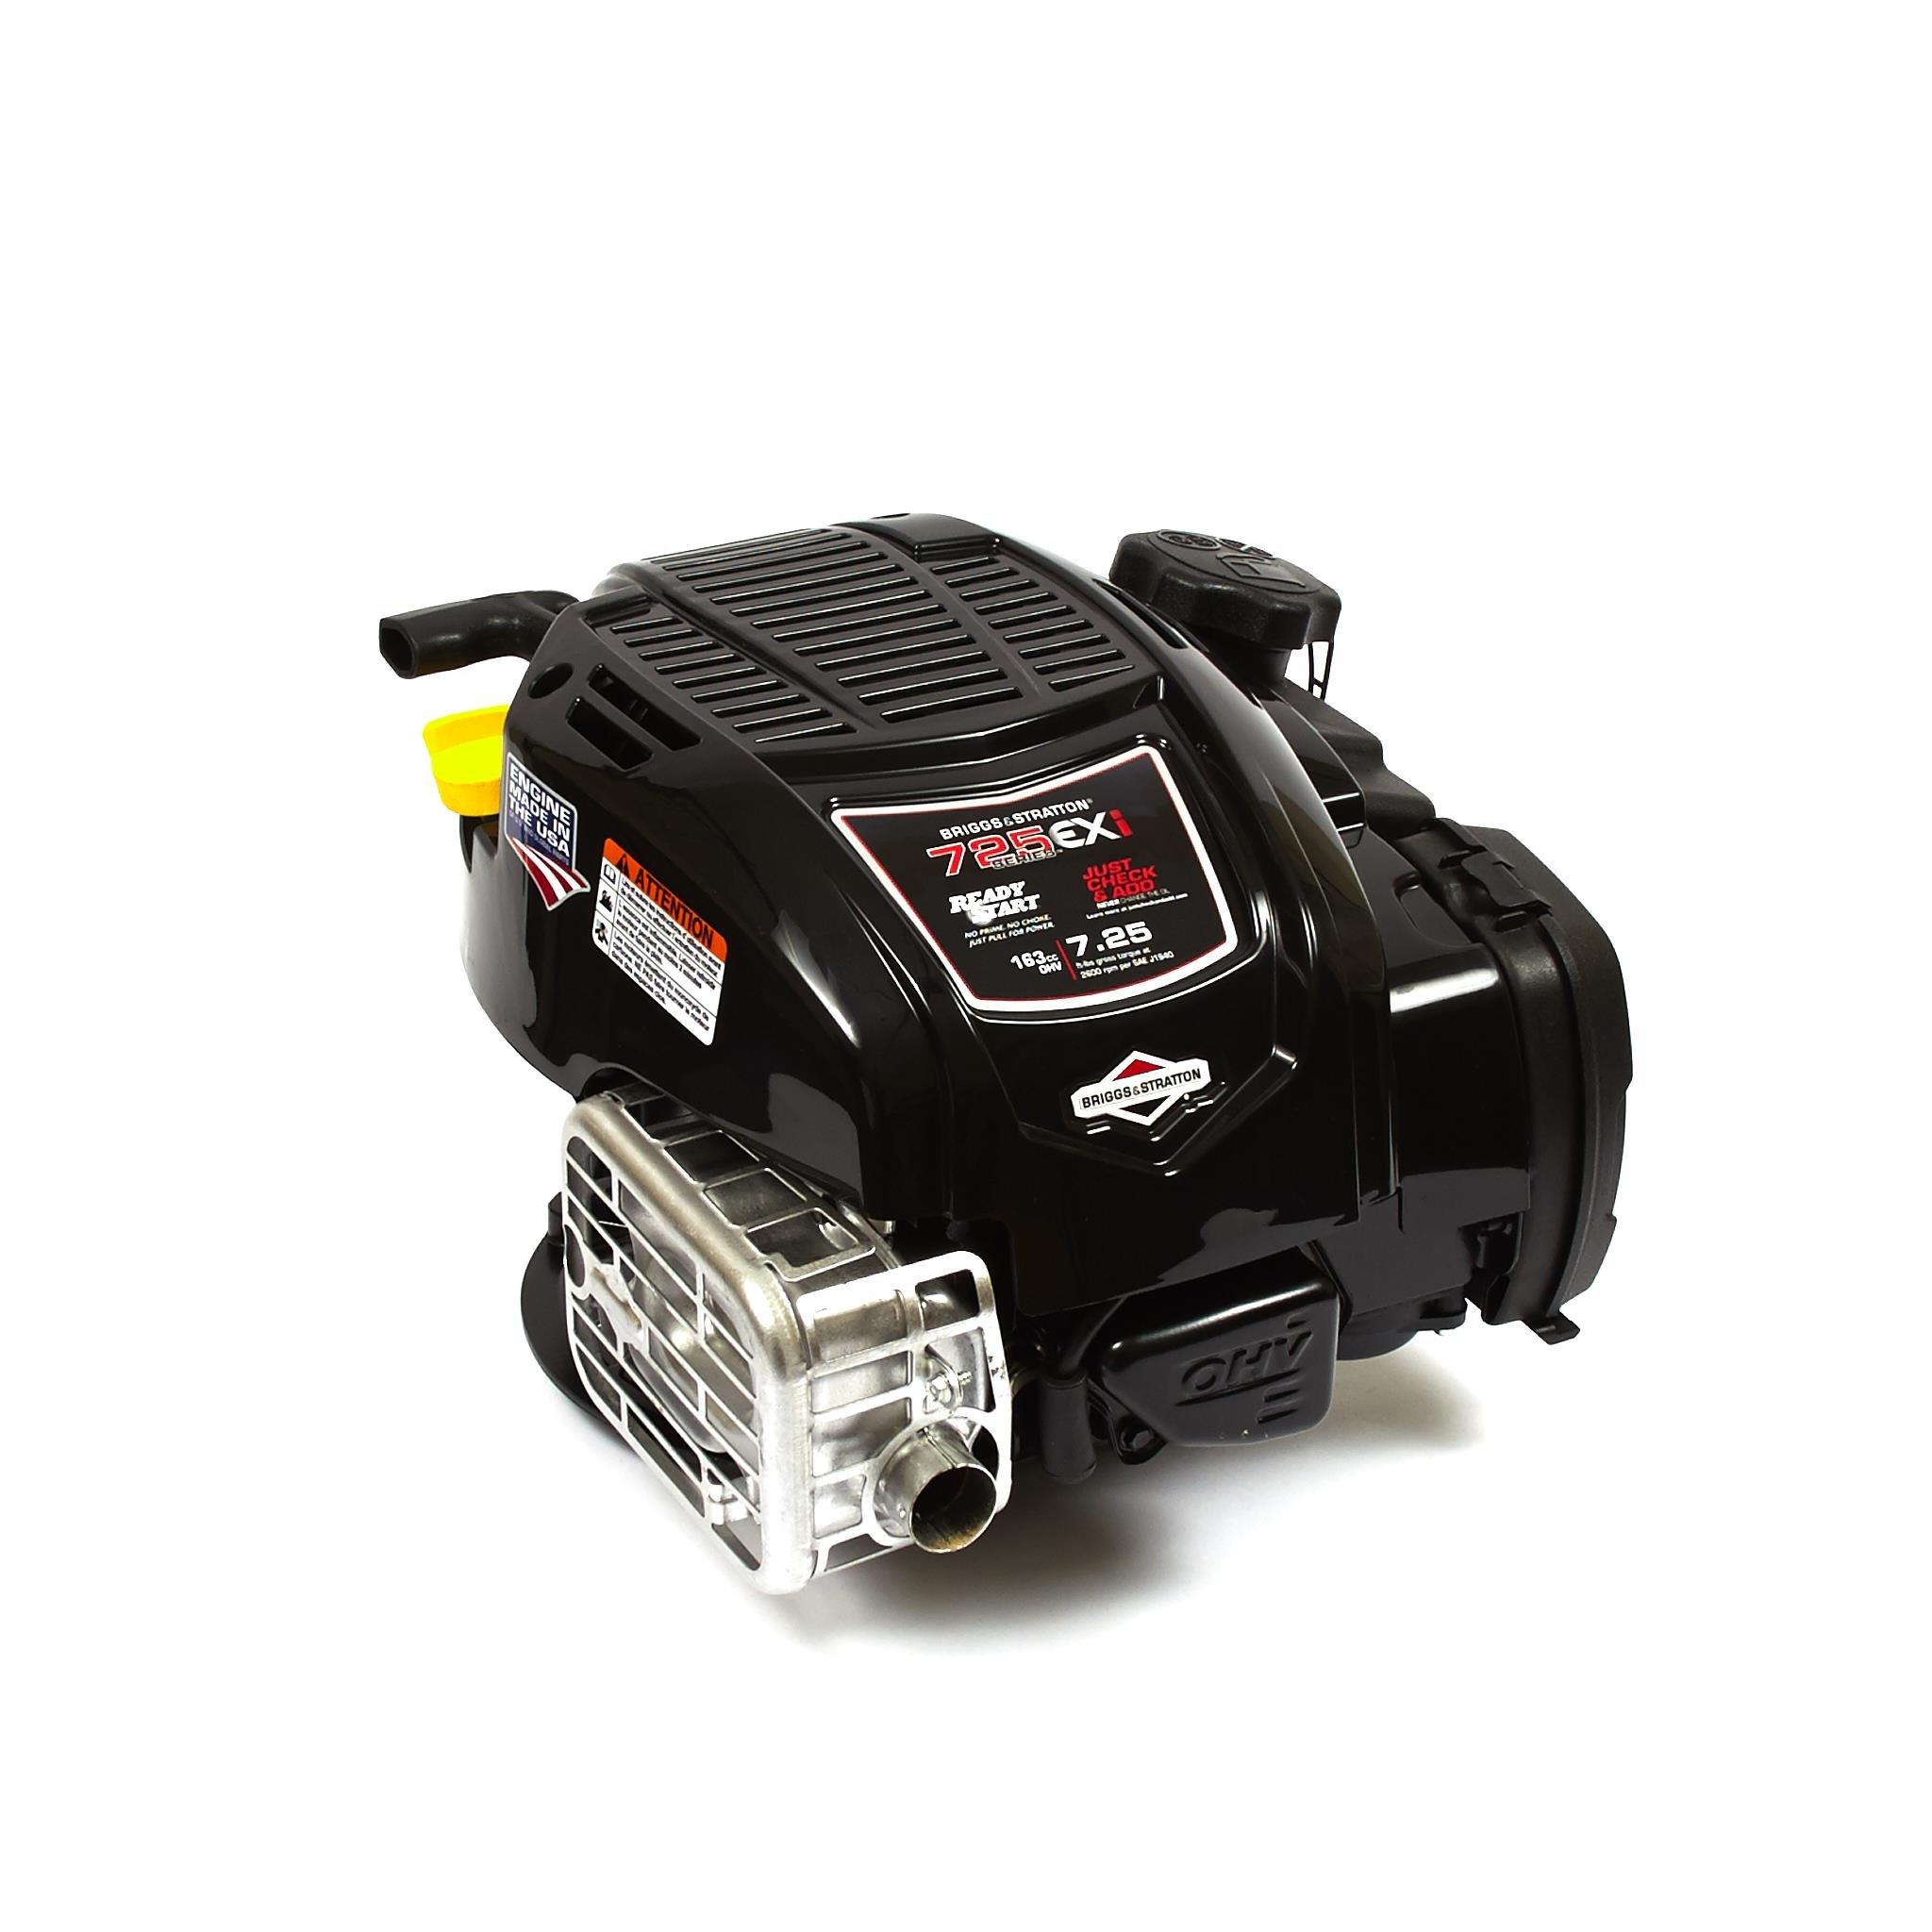 Briggs and Stratton 104M02-0020-F1 163cc 725Exi Series Push Mower Engine